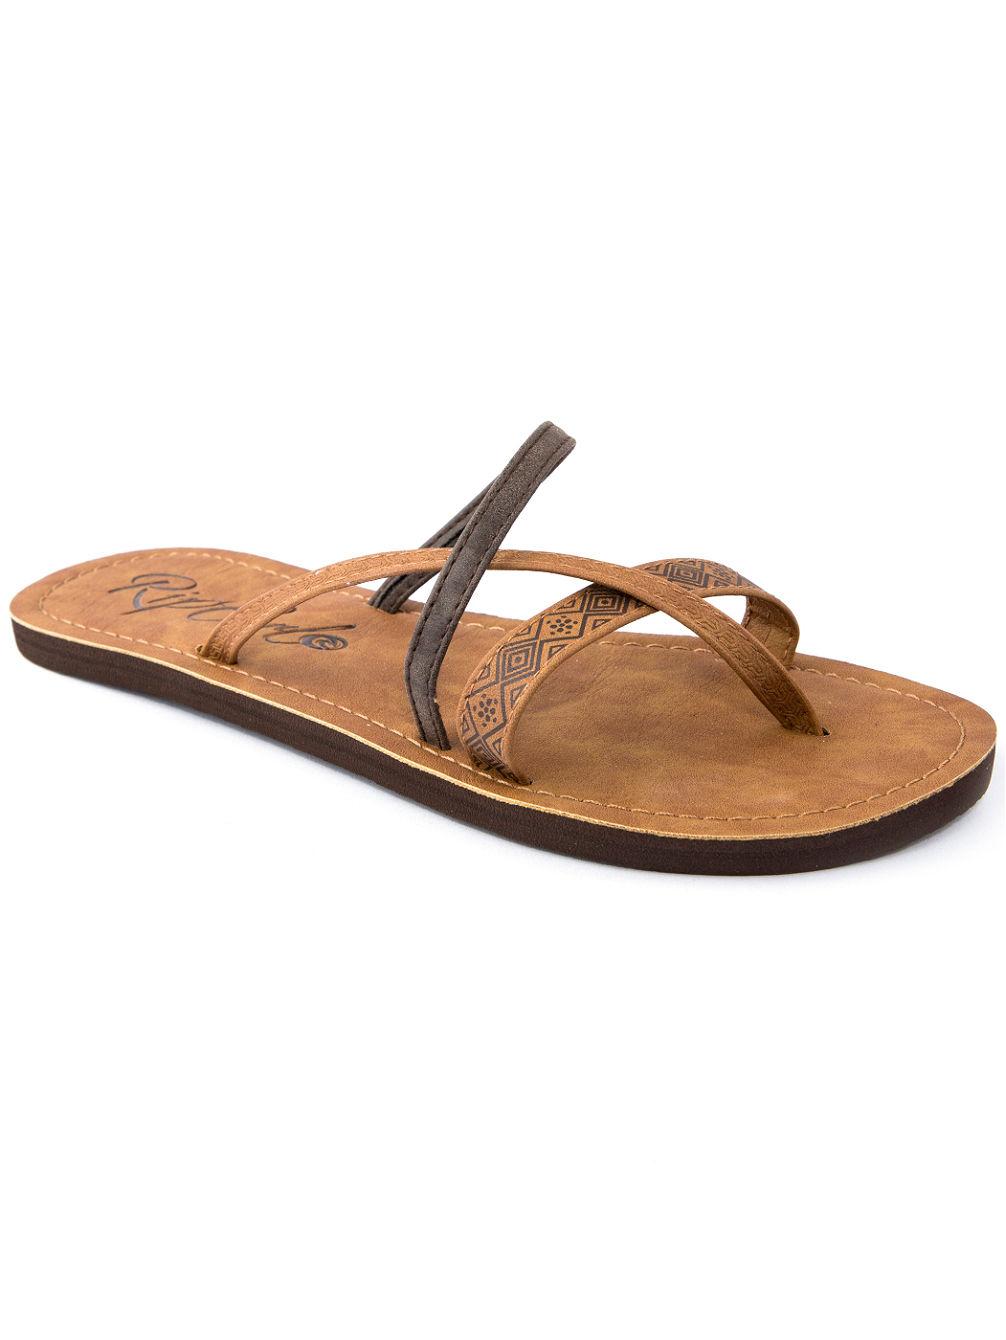 14cefc6752e539 Buy Rip Curl Jordan Sandals Women online at Blue Tomato